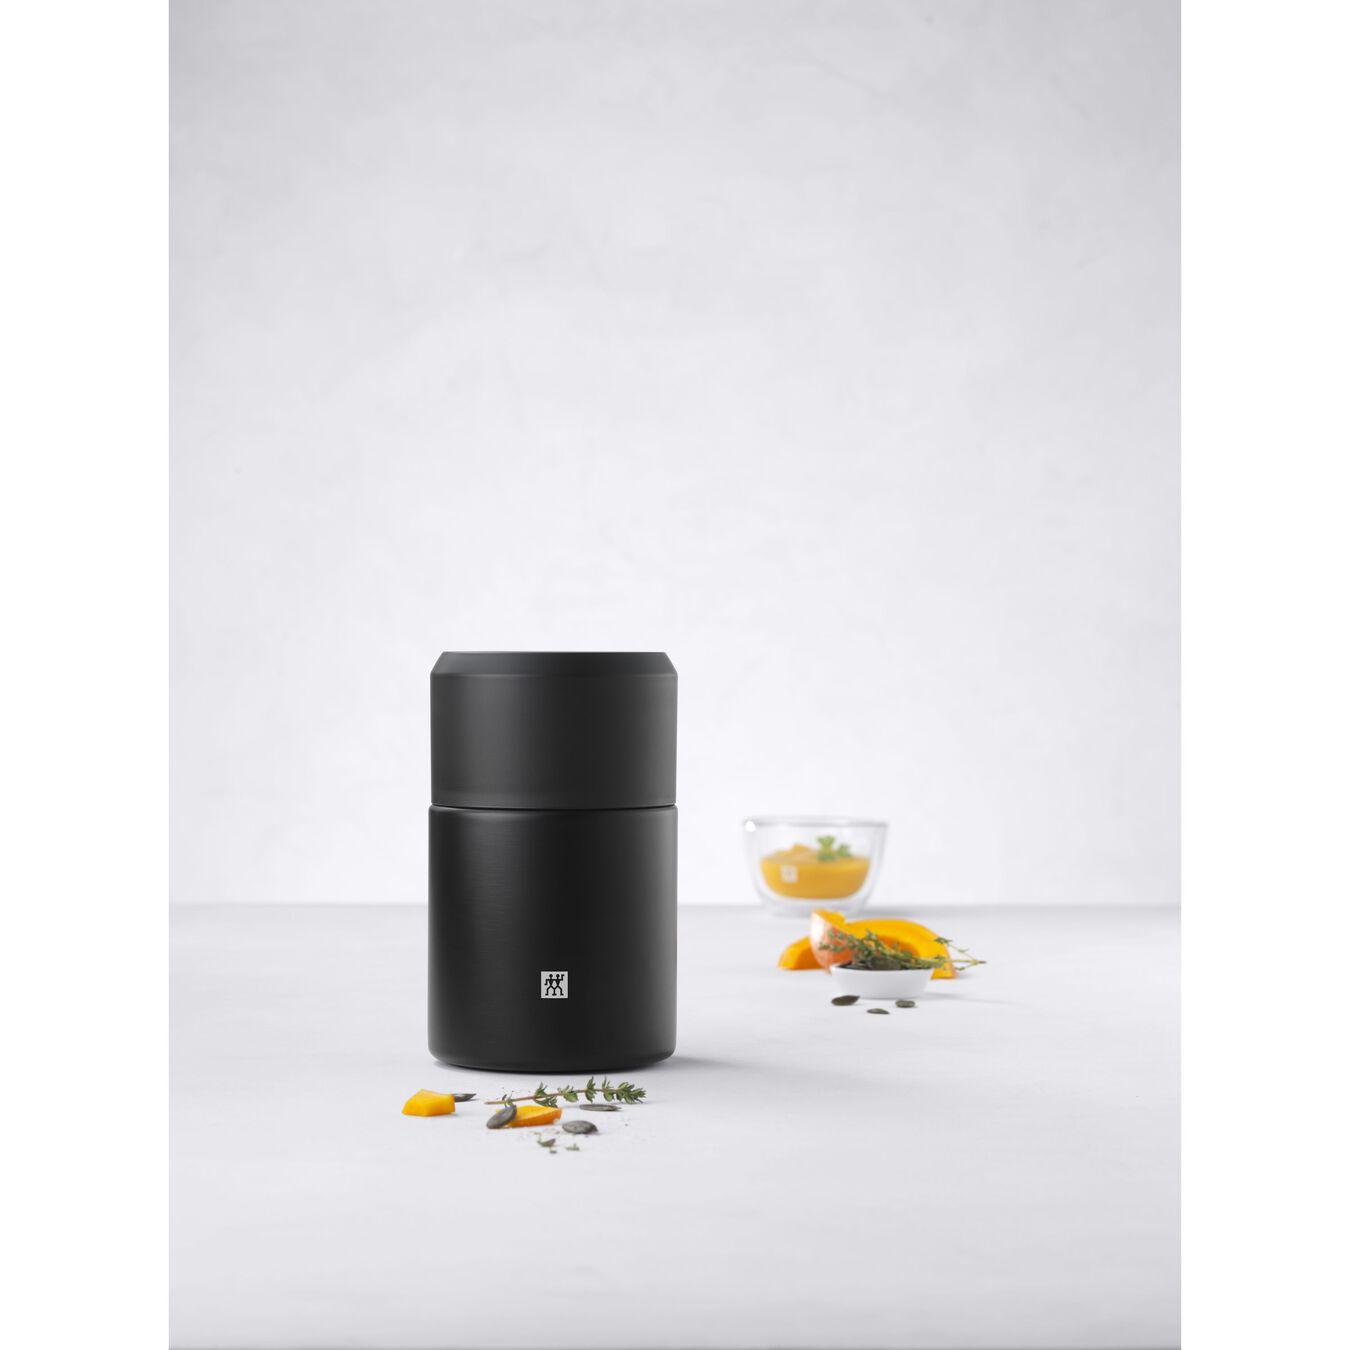 Contenant alimentaire isotherme, Noir | Acier inoxydable | 700 ml,,large 6